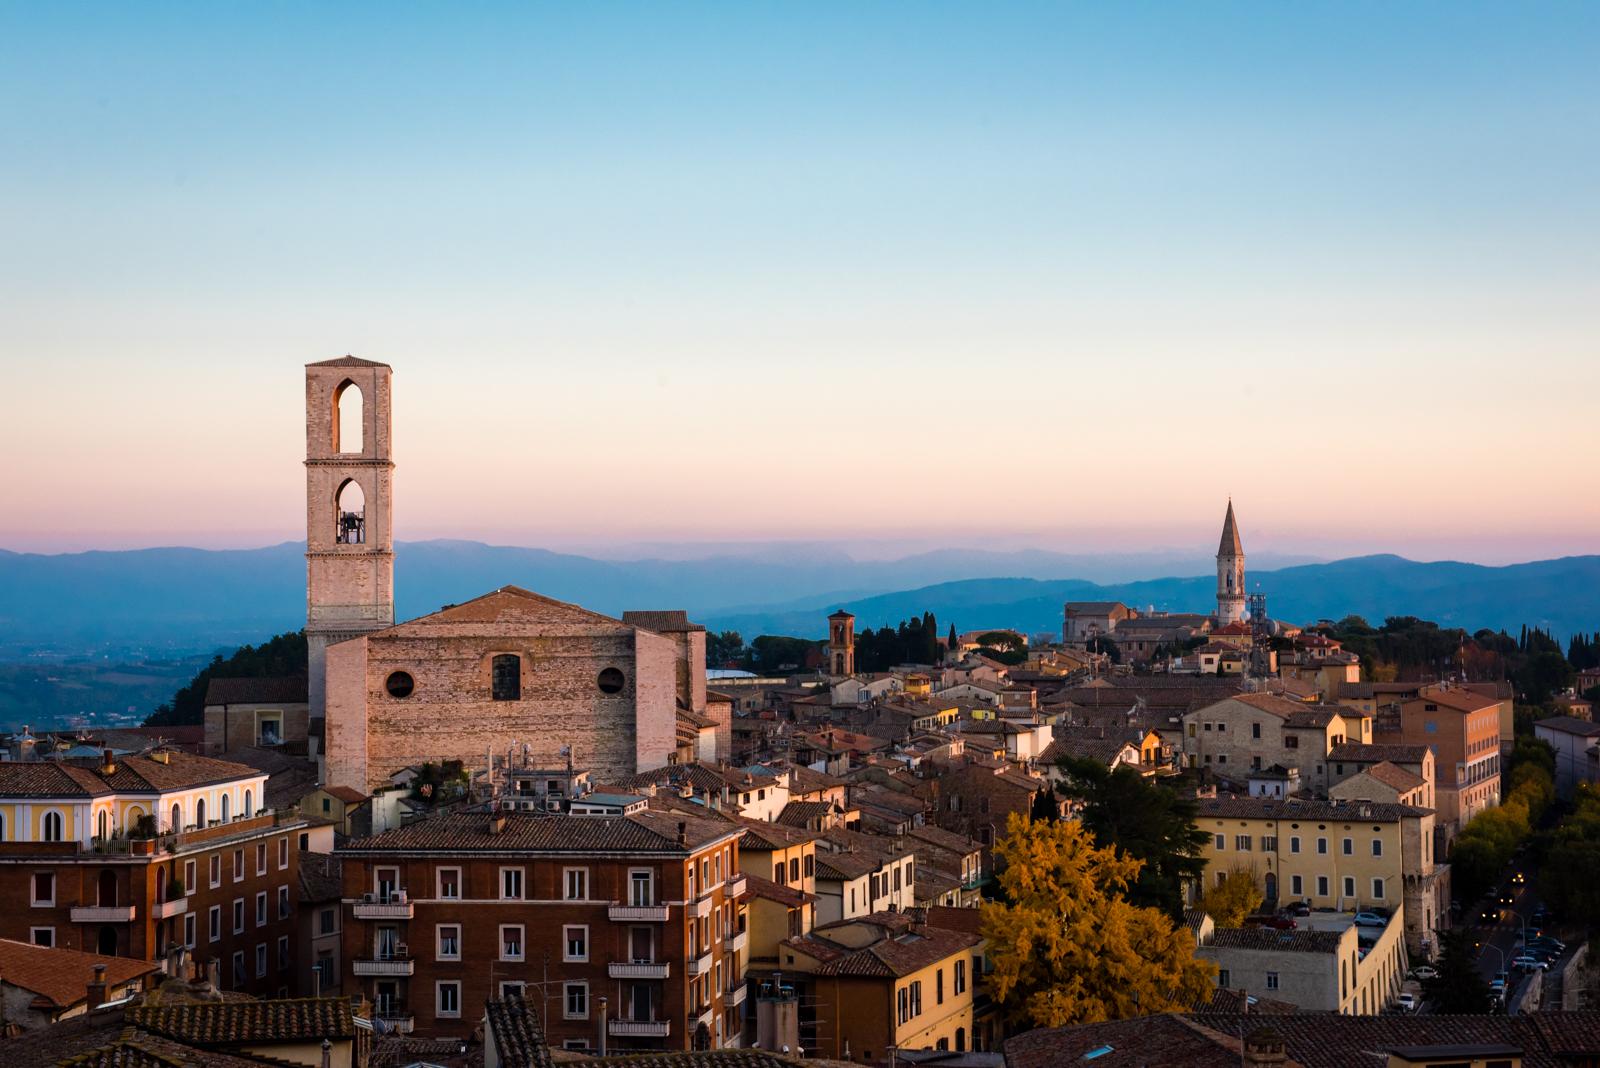 From Centro Storico, Perugia